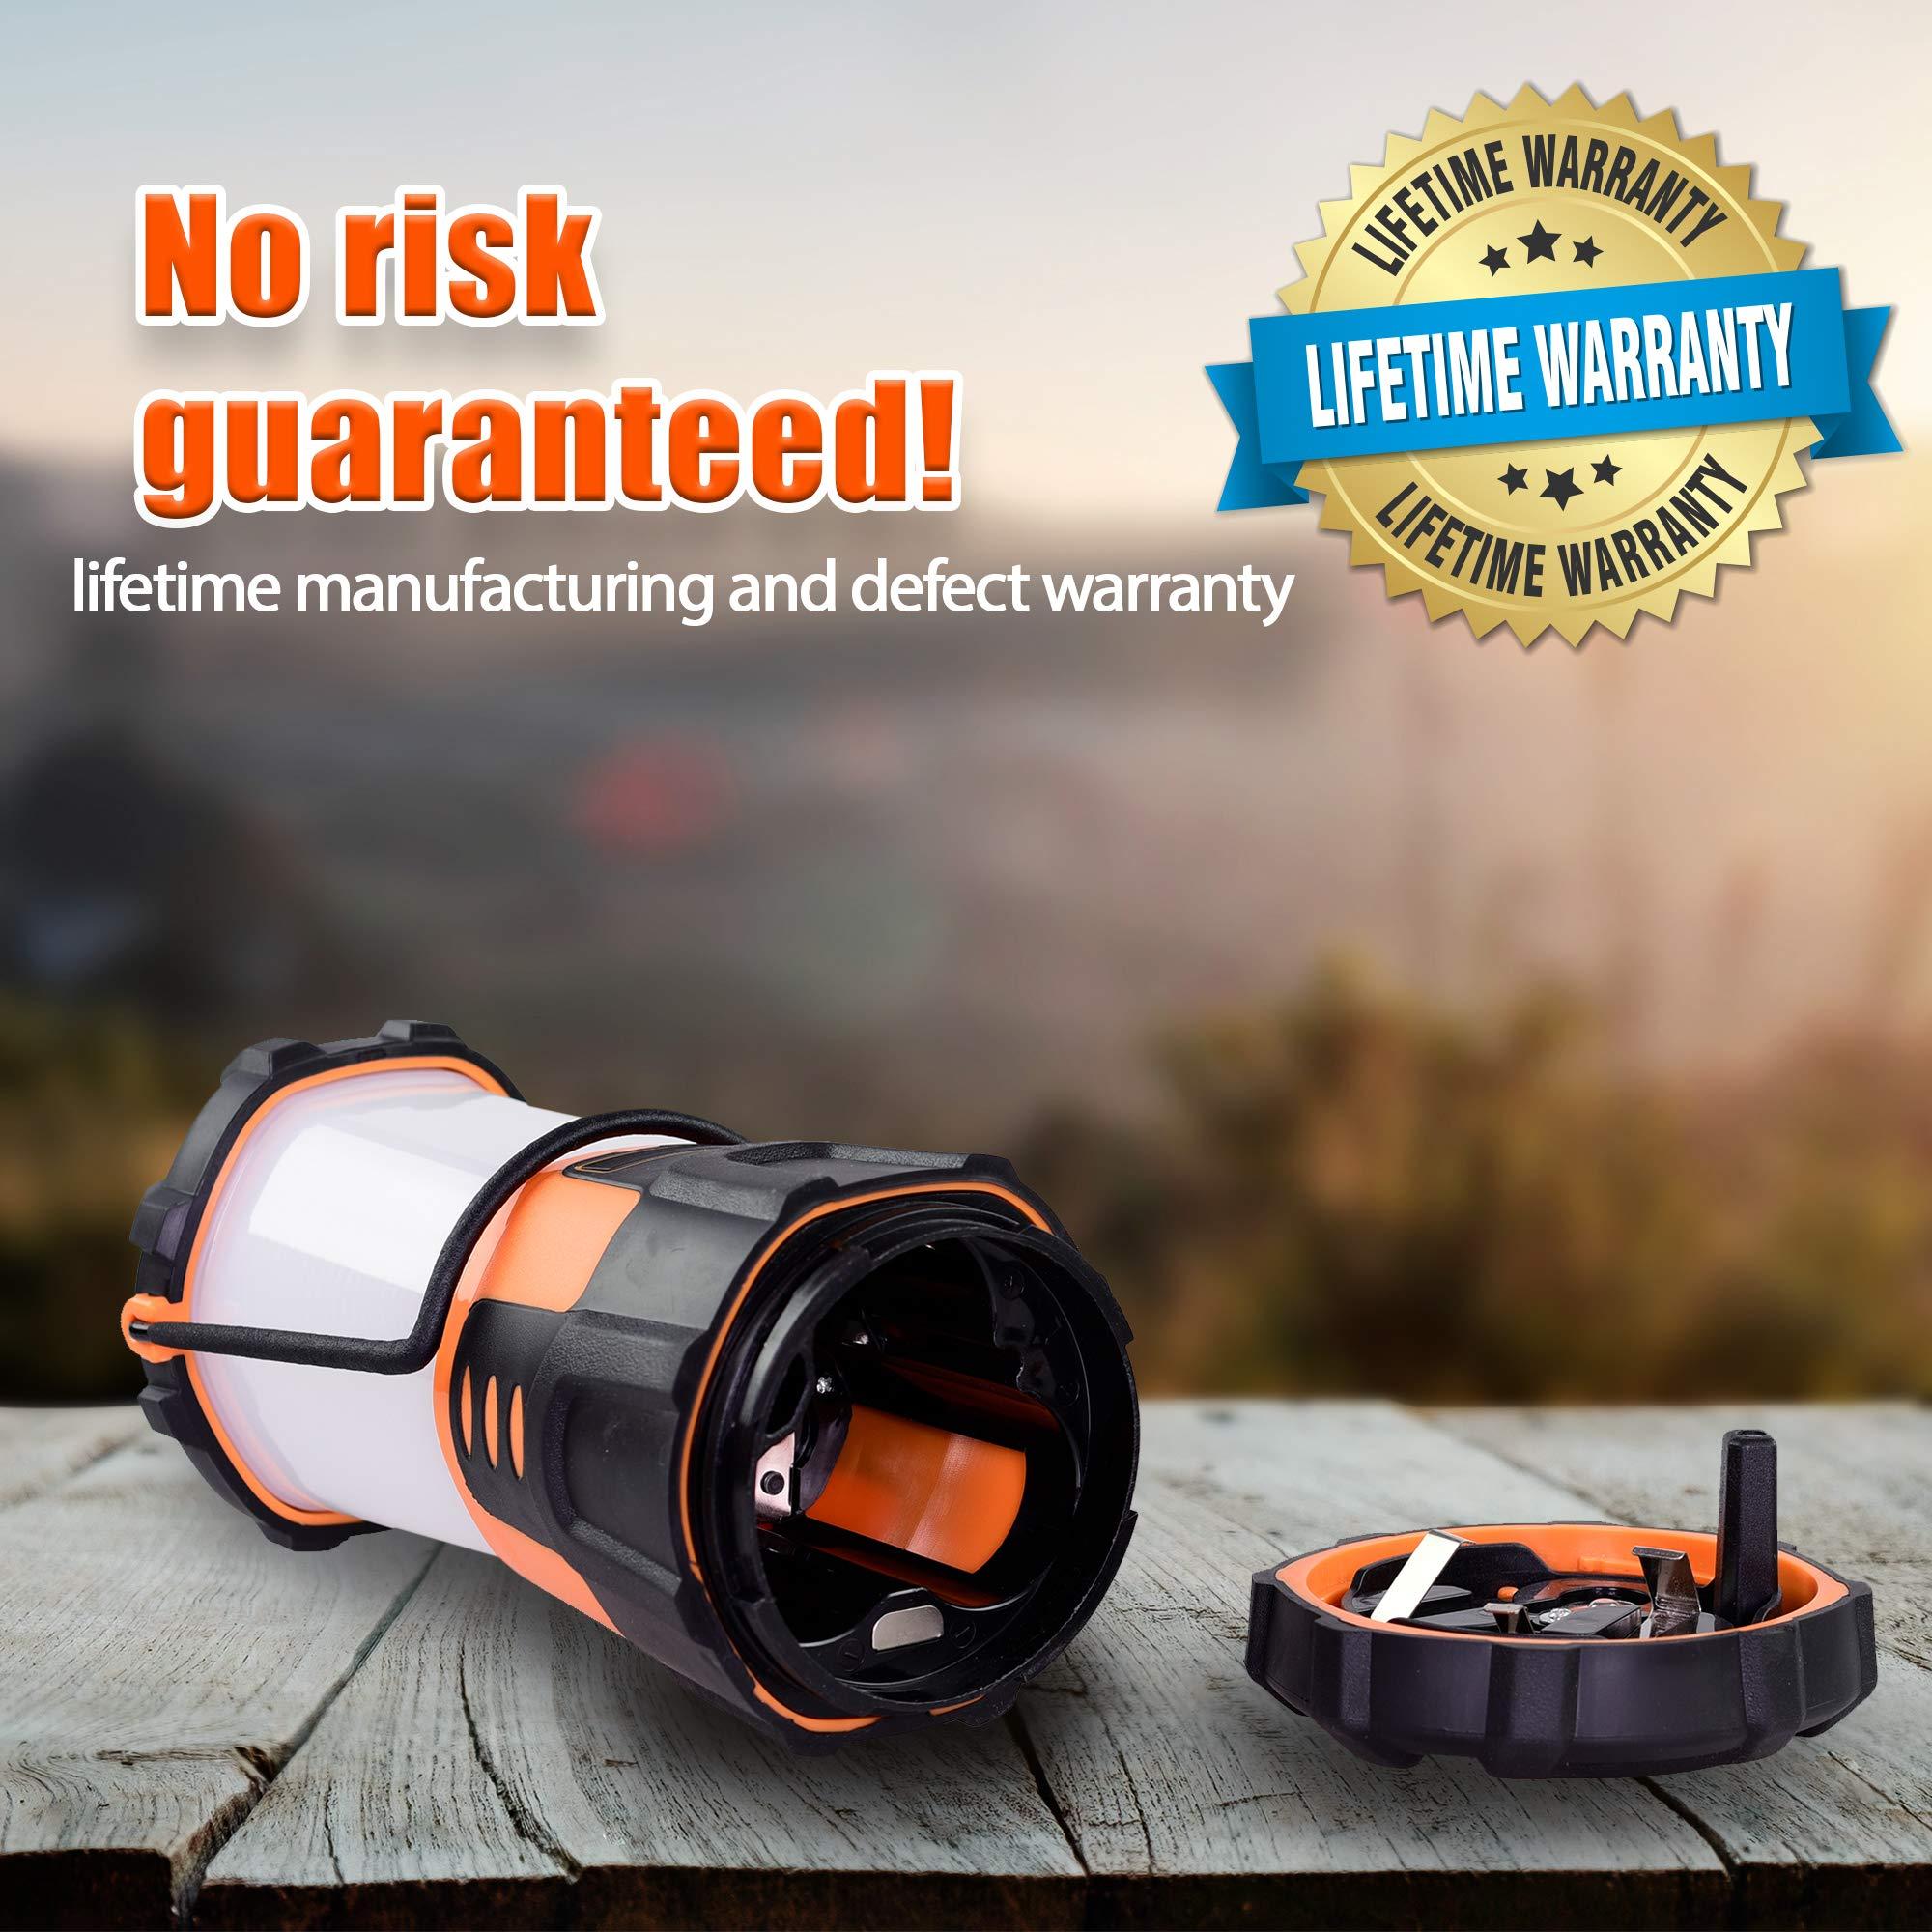 Blazin' Fireball | Brightest Lanterns Battery Powered | LED Hurricane Lantern | Emergency, Storm, Camping Torch | Battery Operated Lights | 1000 Lumen Lantern by Blazin' Bison (Image #8)